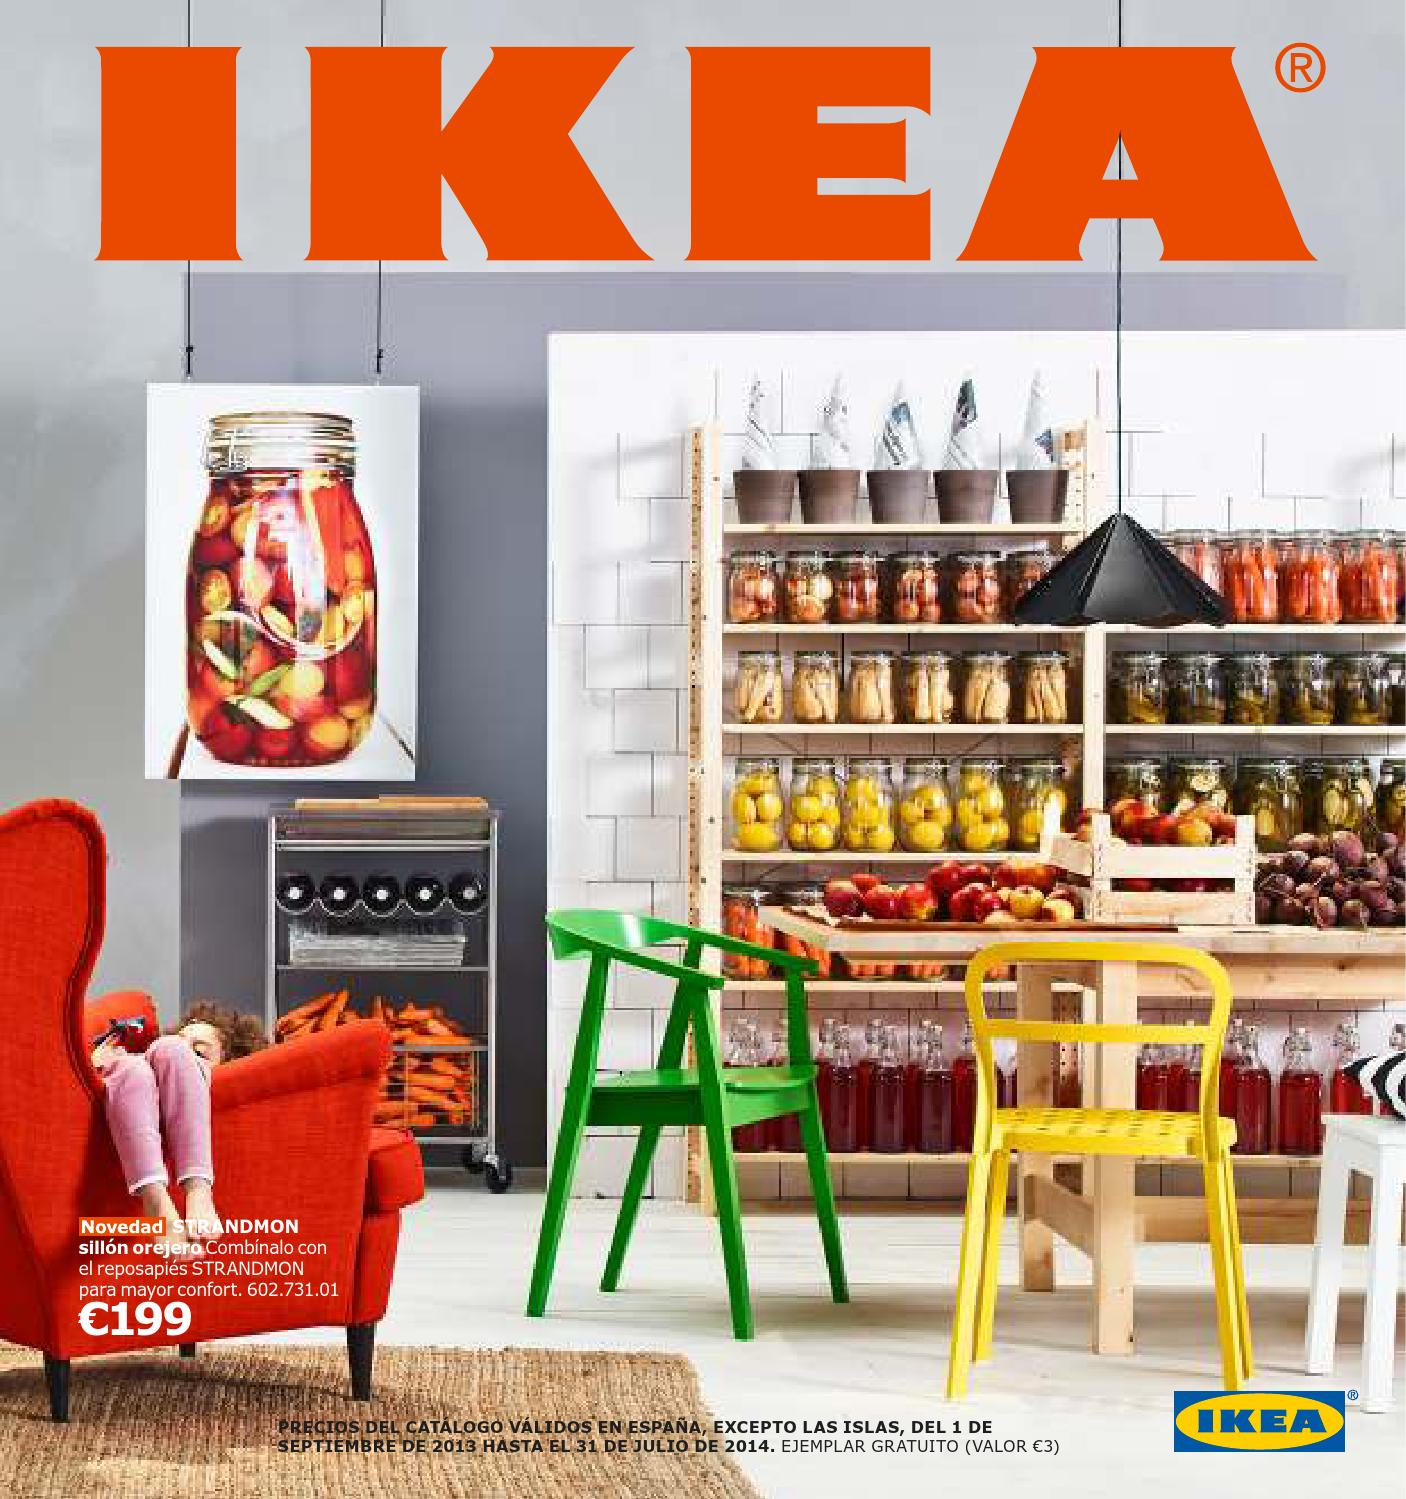 IKEA - Catalogo 2014 by miguelator - issuu